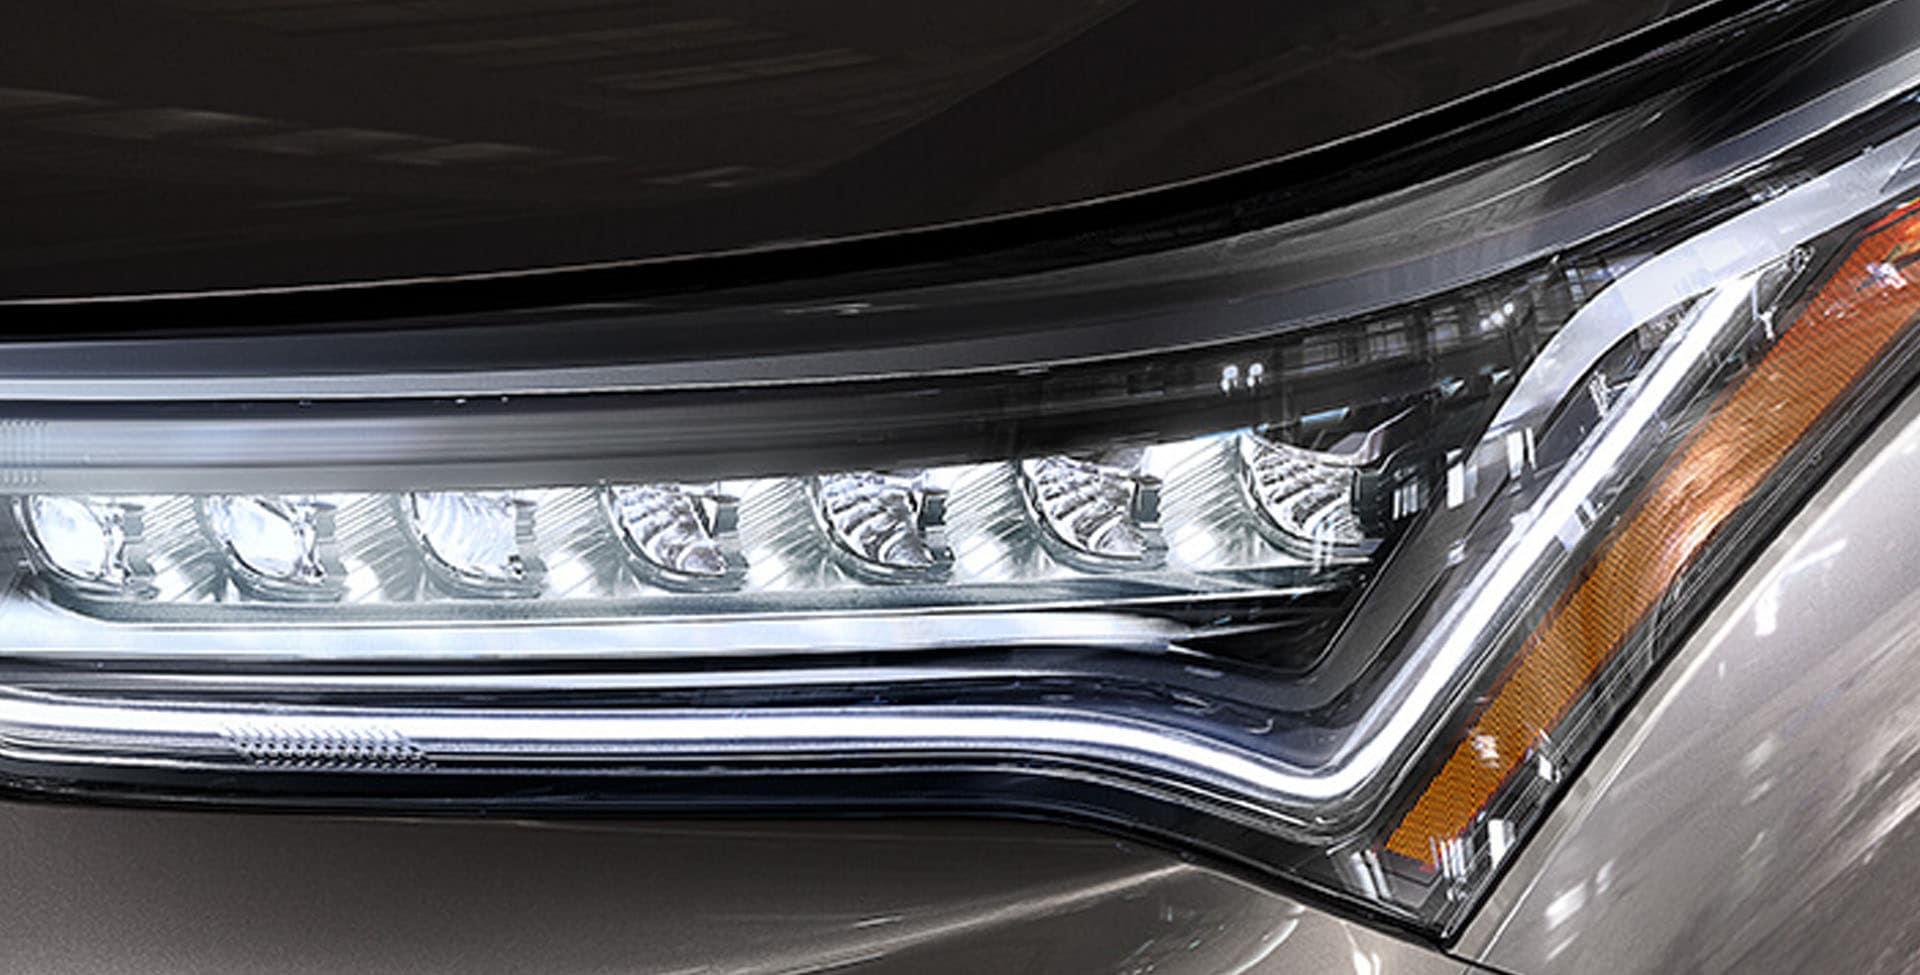 Acura RDX LED lighting